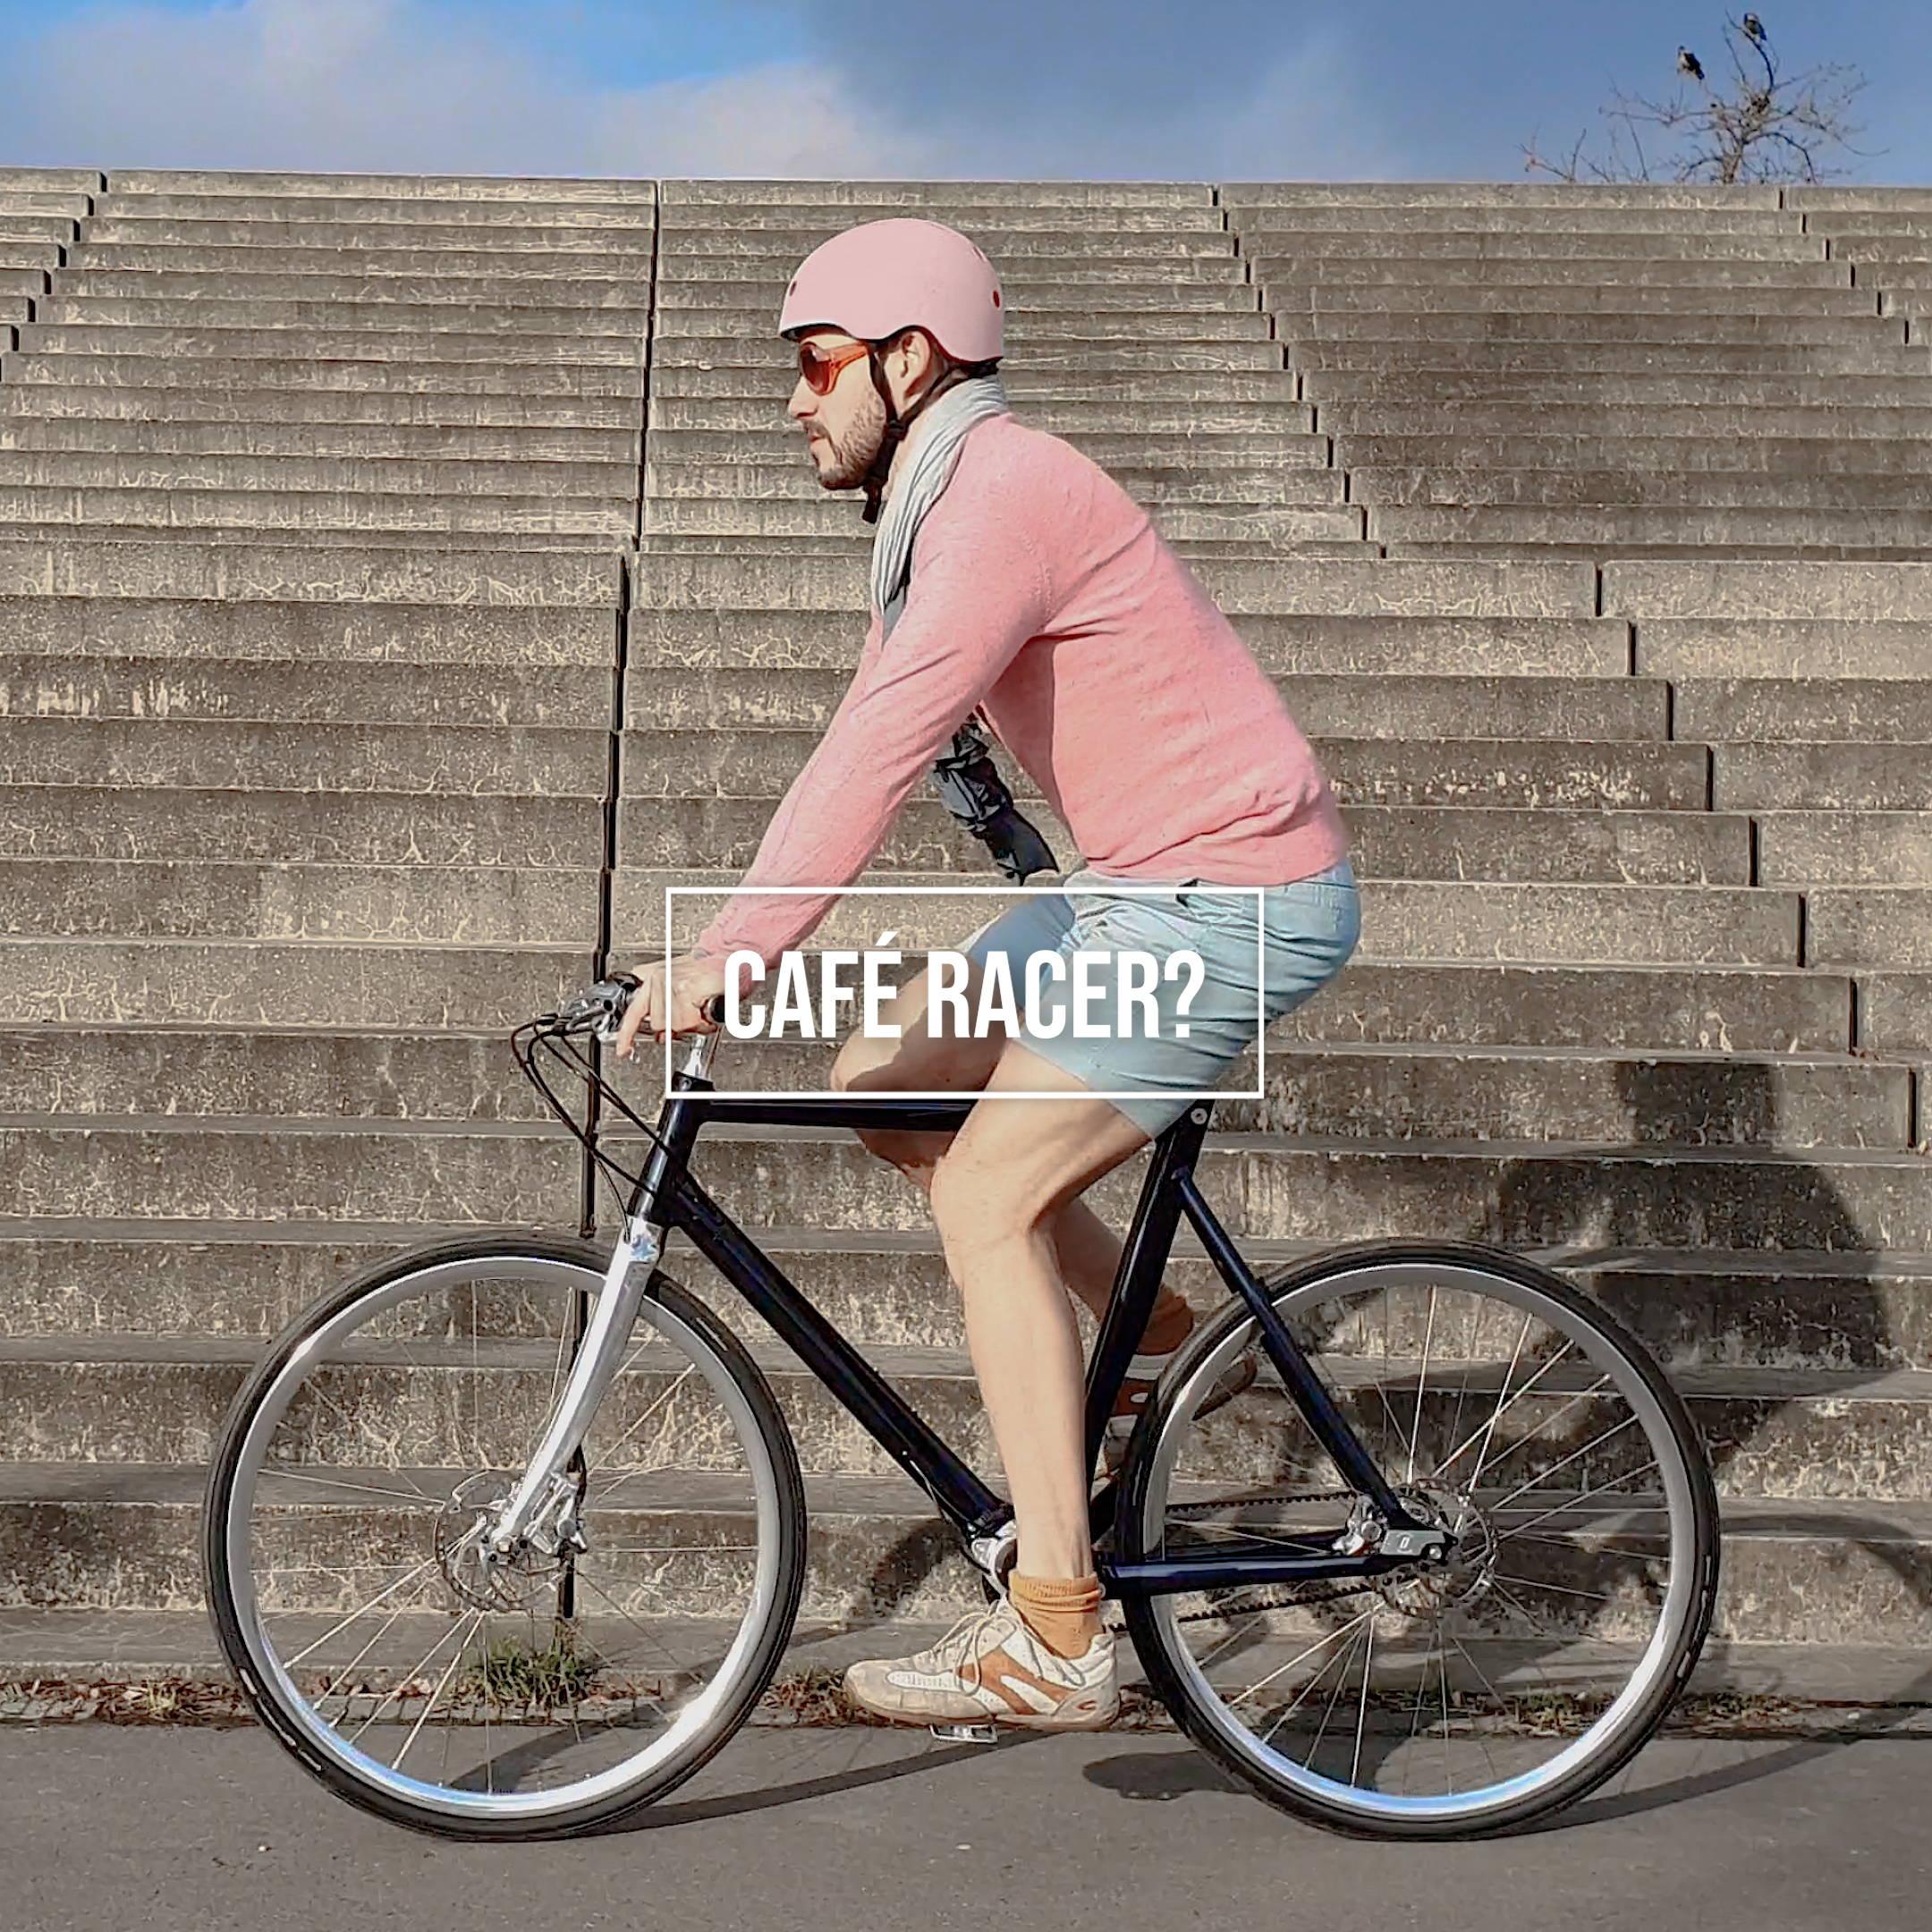 Bike Wheel Lock on Café Racer bicycle